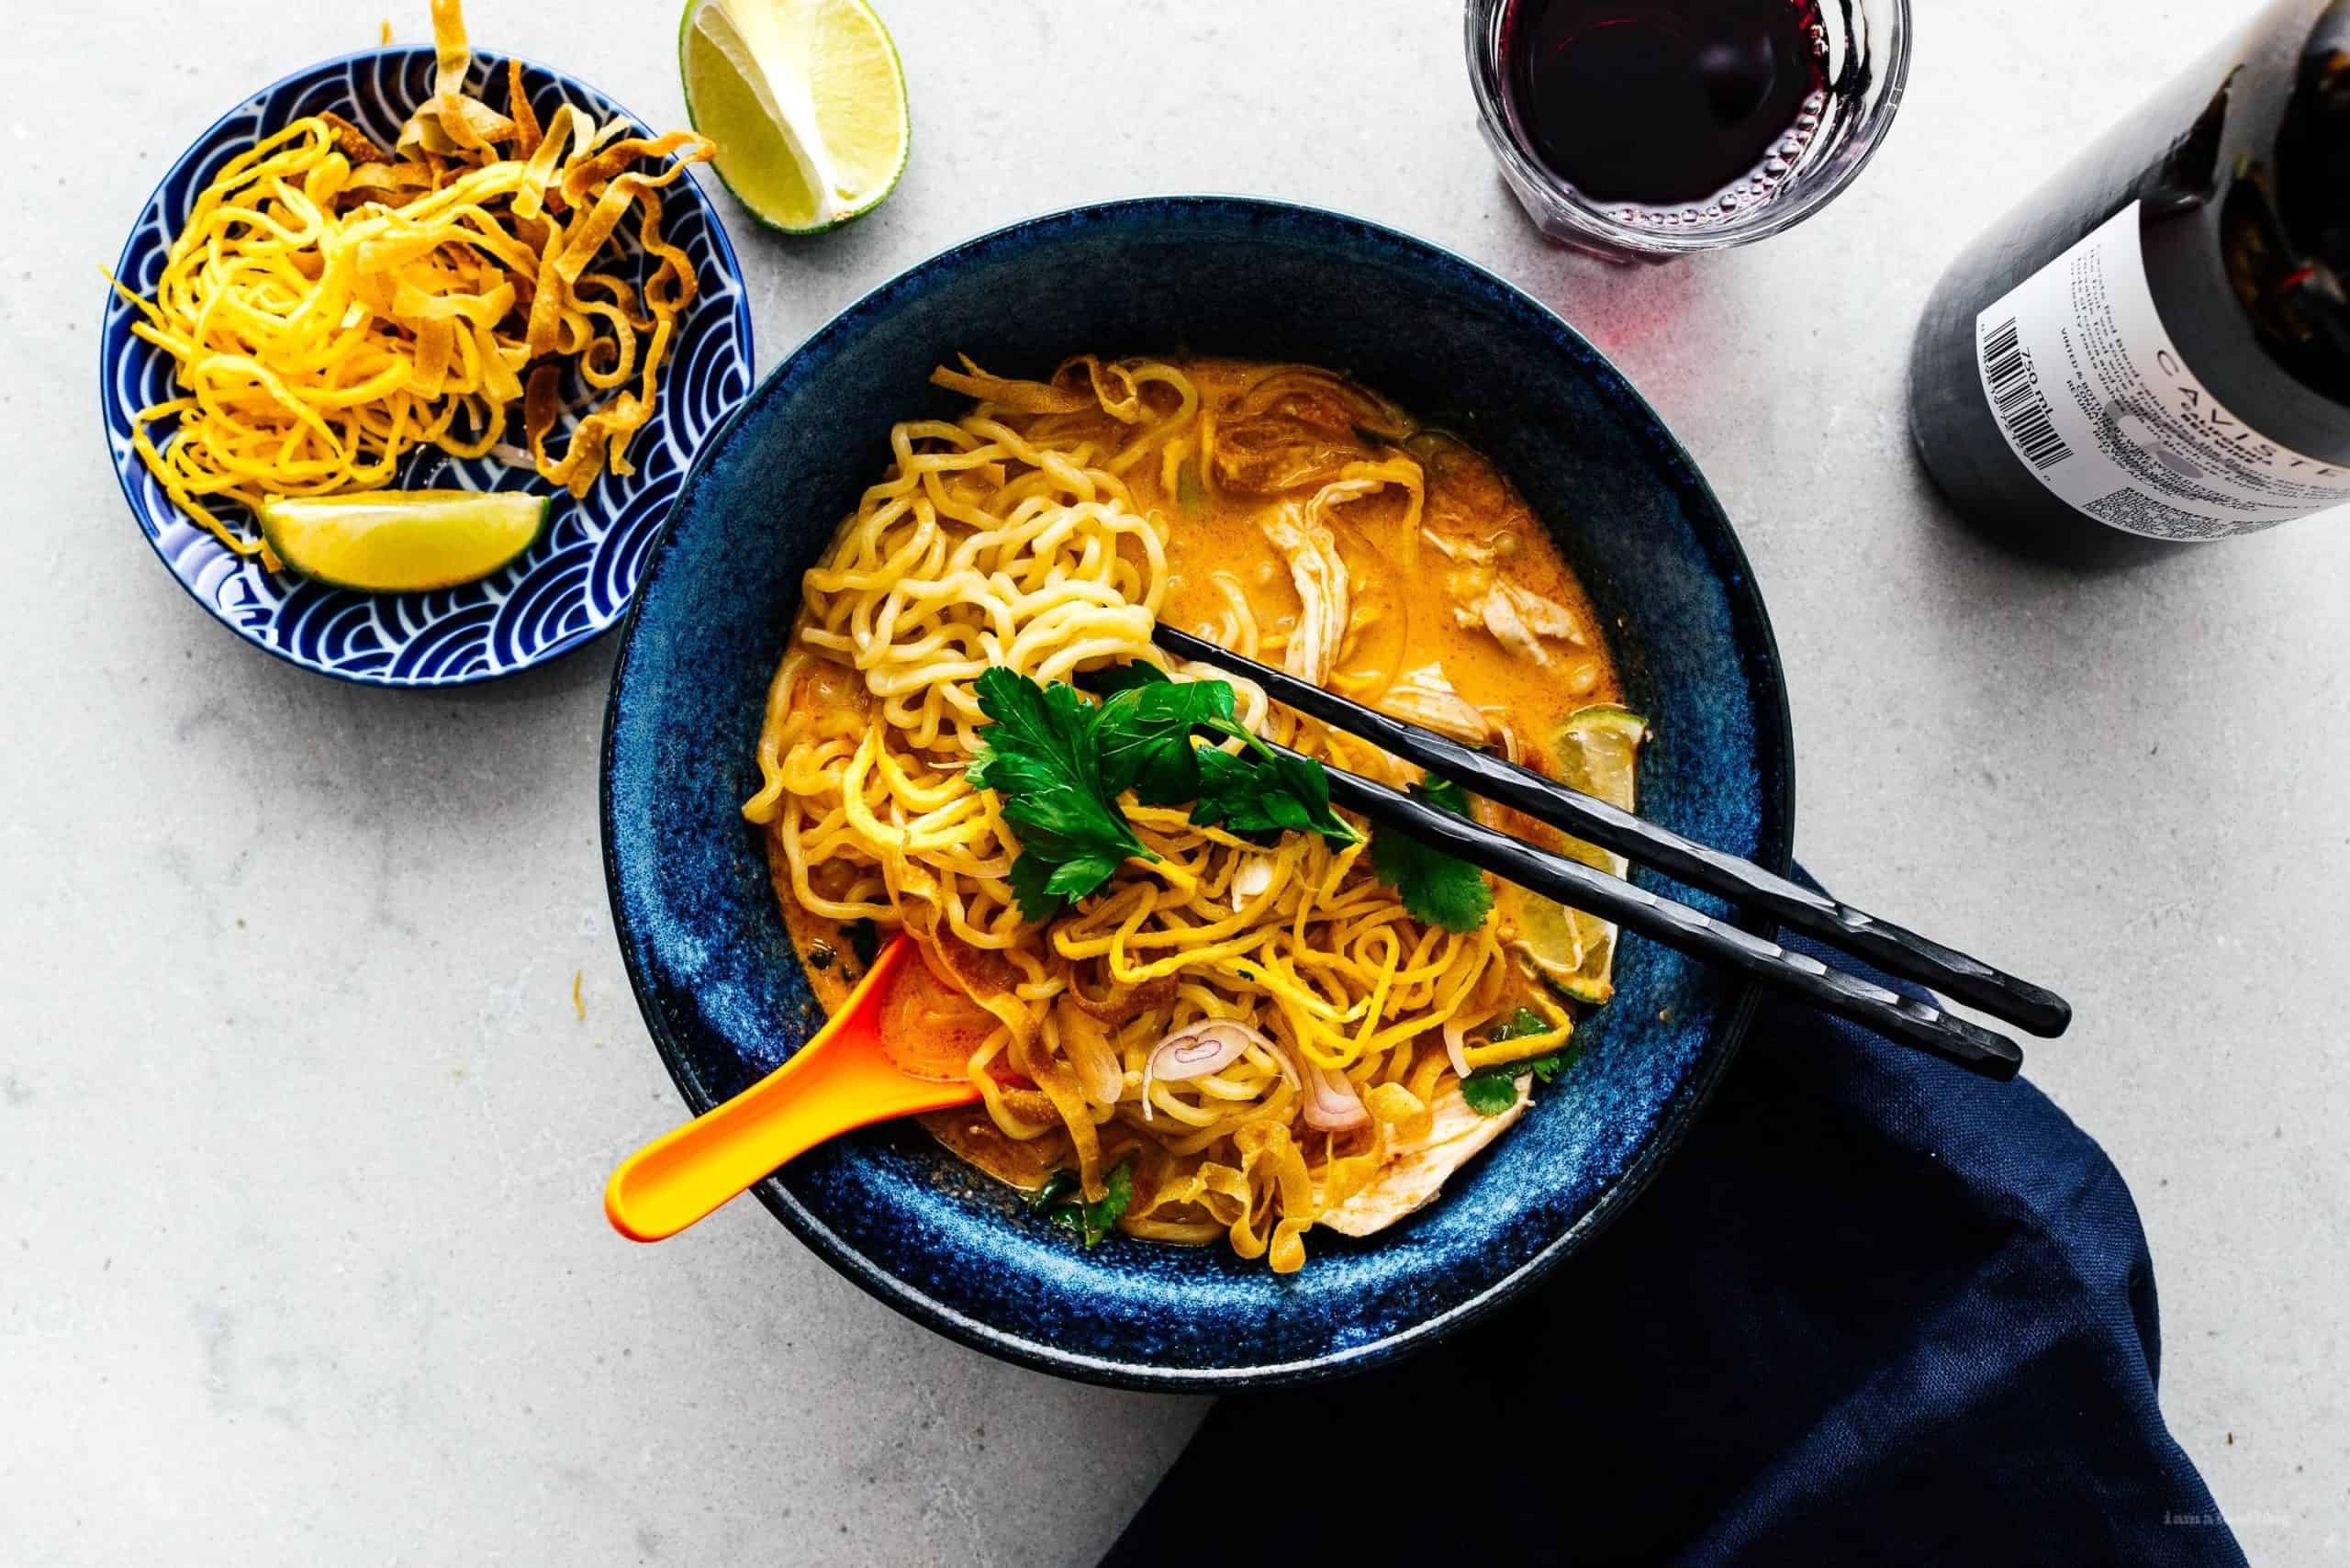 gambar makanan khas thailand Khao Soi